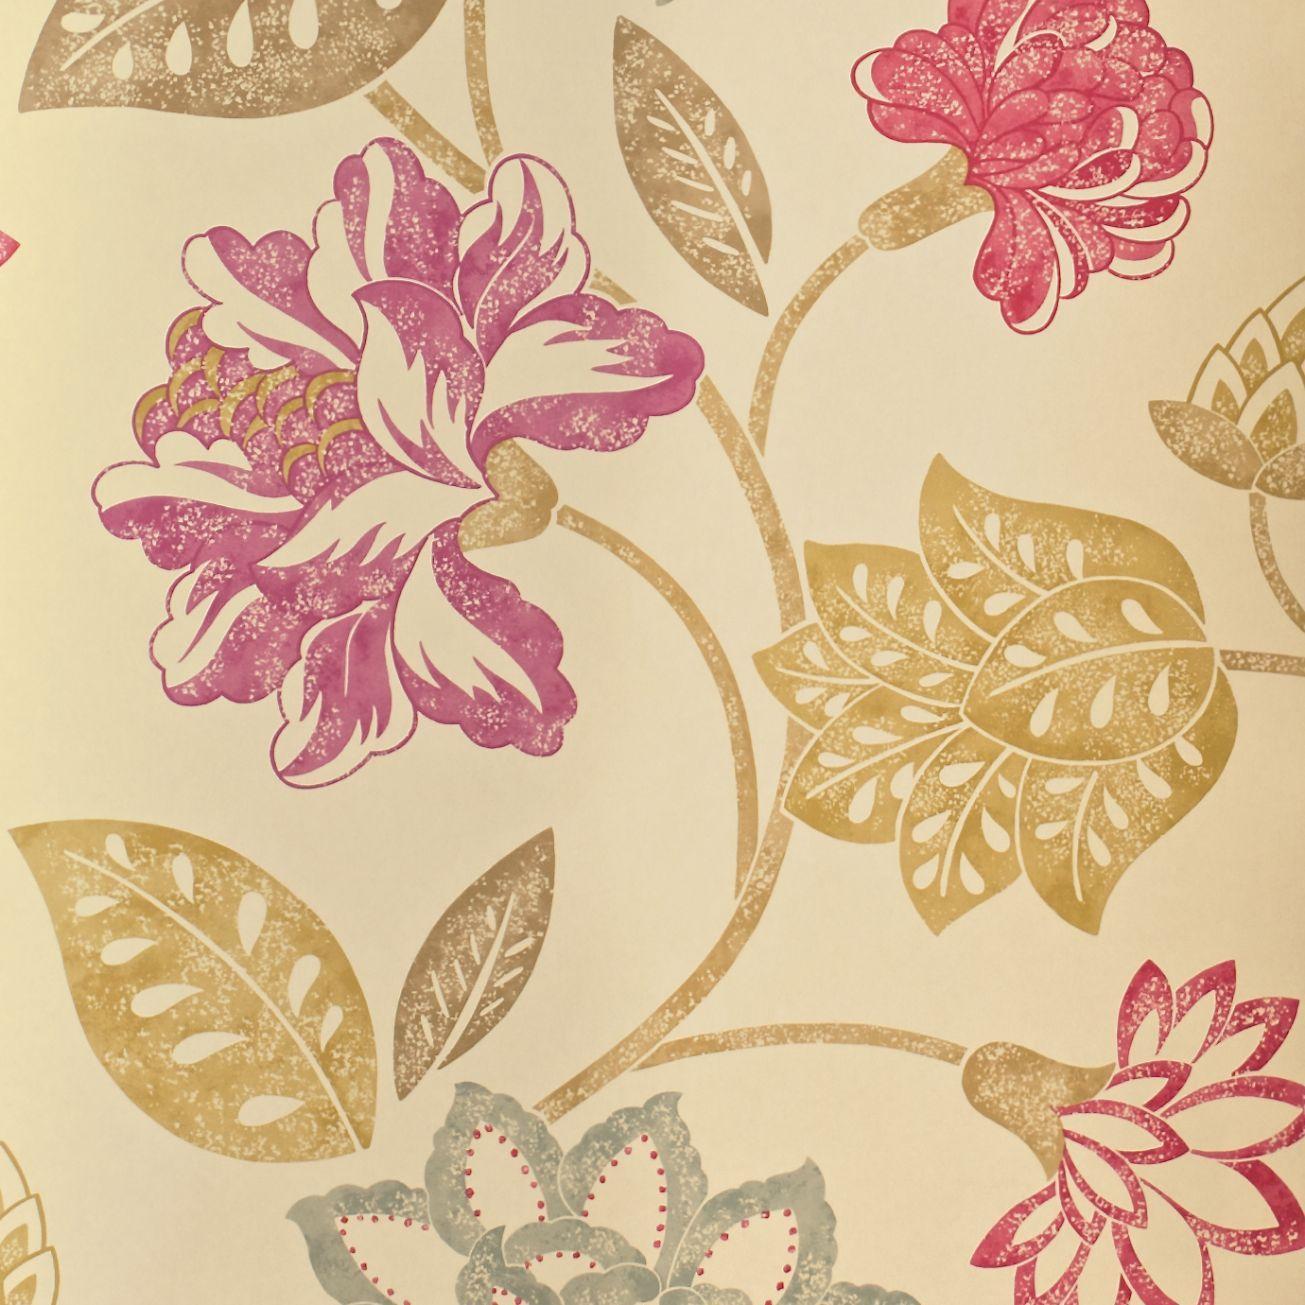 Pink And Gold Wallpaper Desktop Backgrounds Inspiration